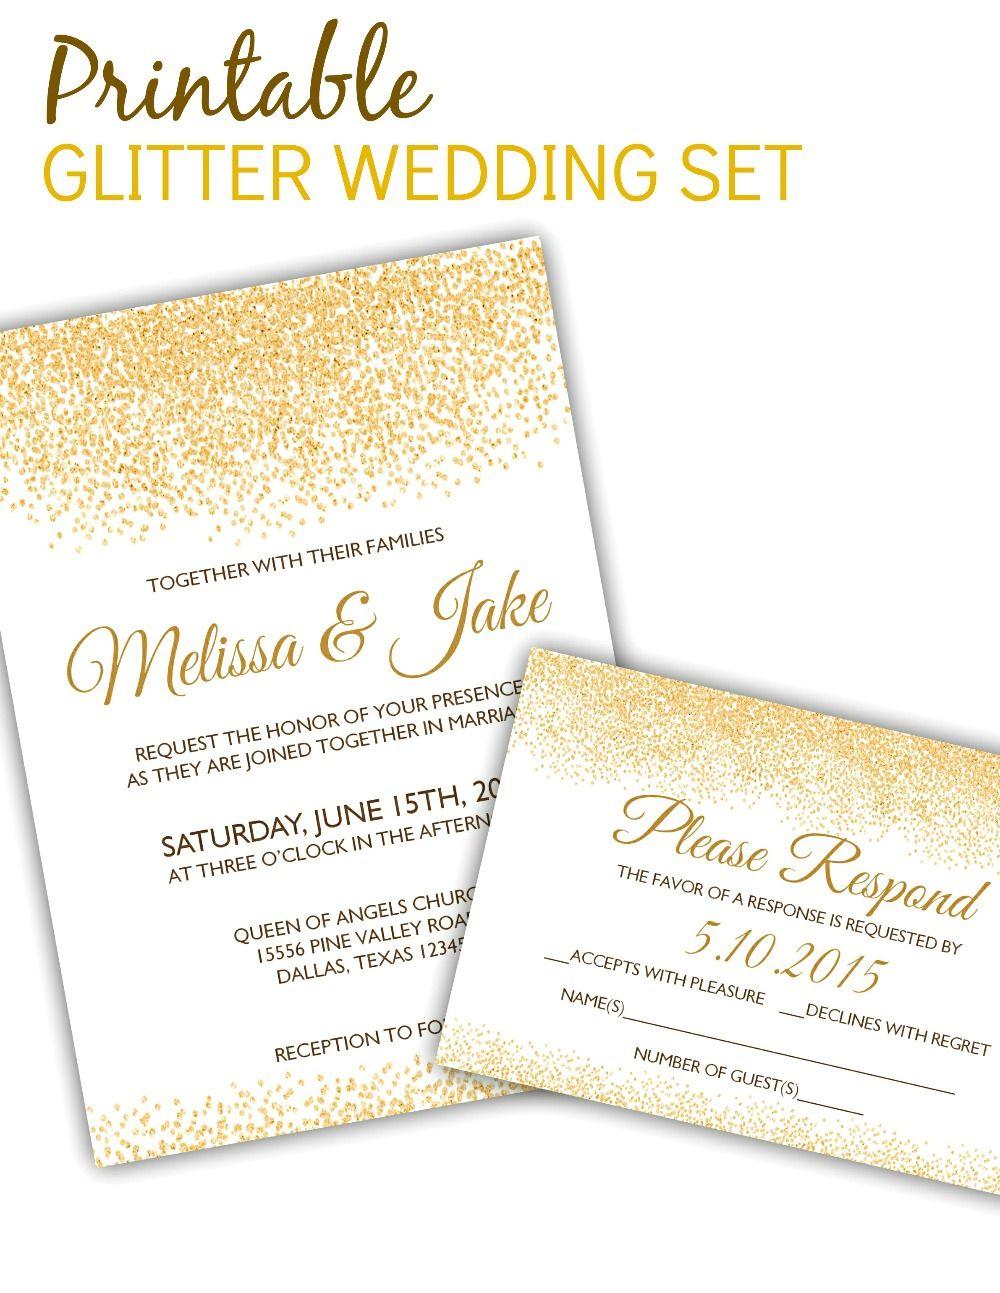 Printable Glitter Invitation Rsvp Template Modern Wedding Invitation Wording Wedding Invitation Templates Invitation Templates Word